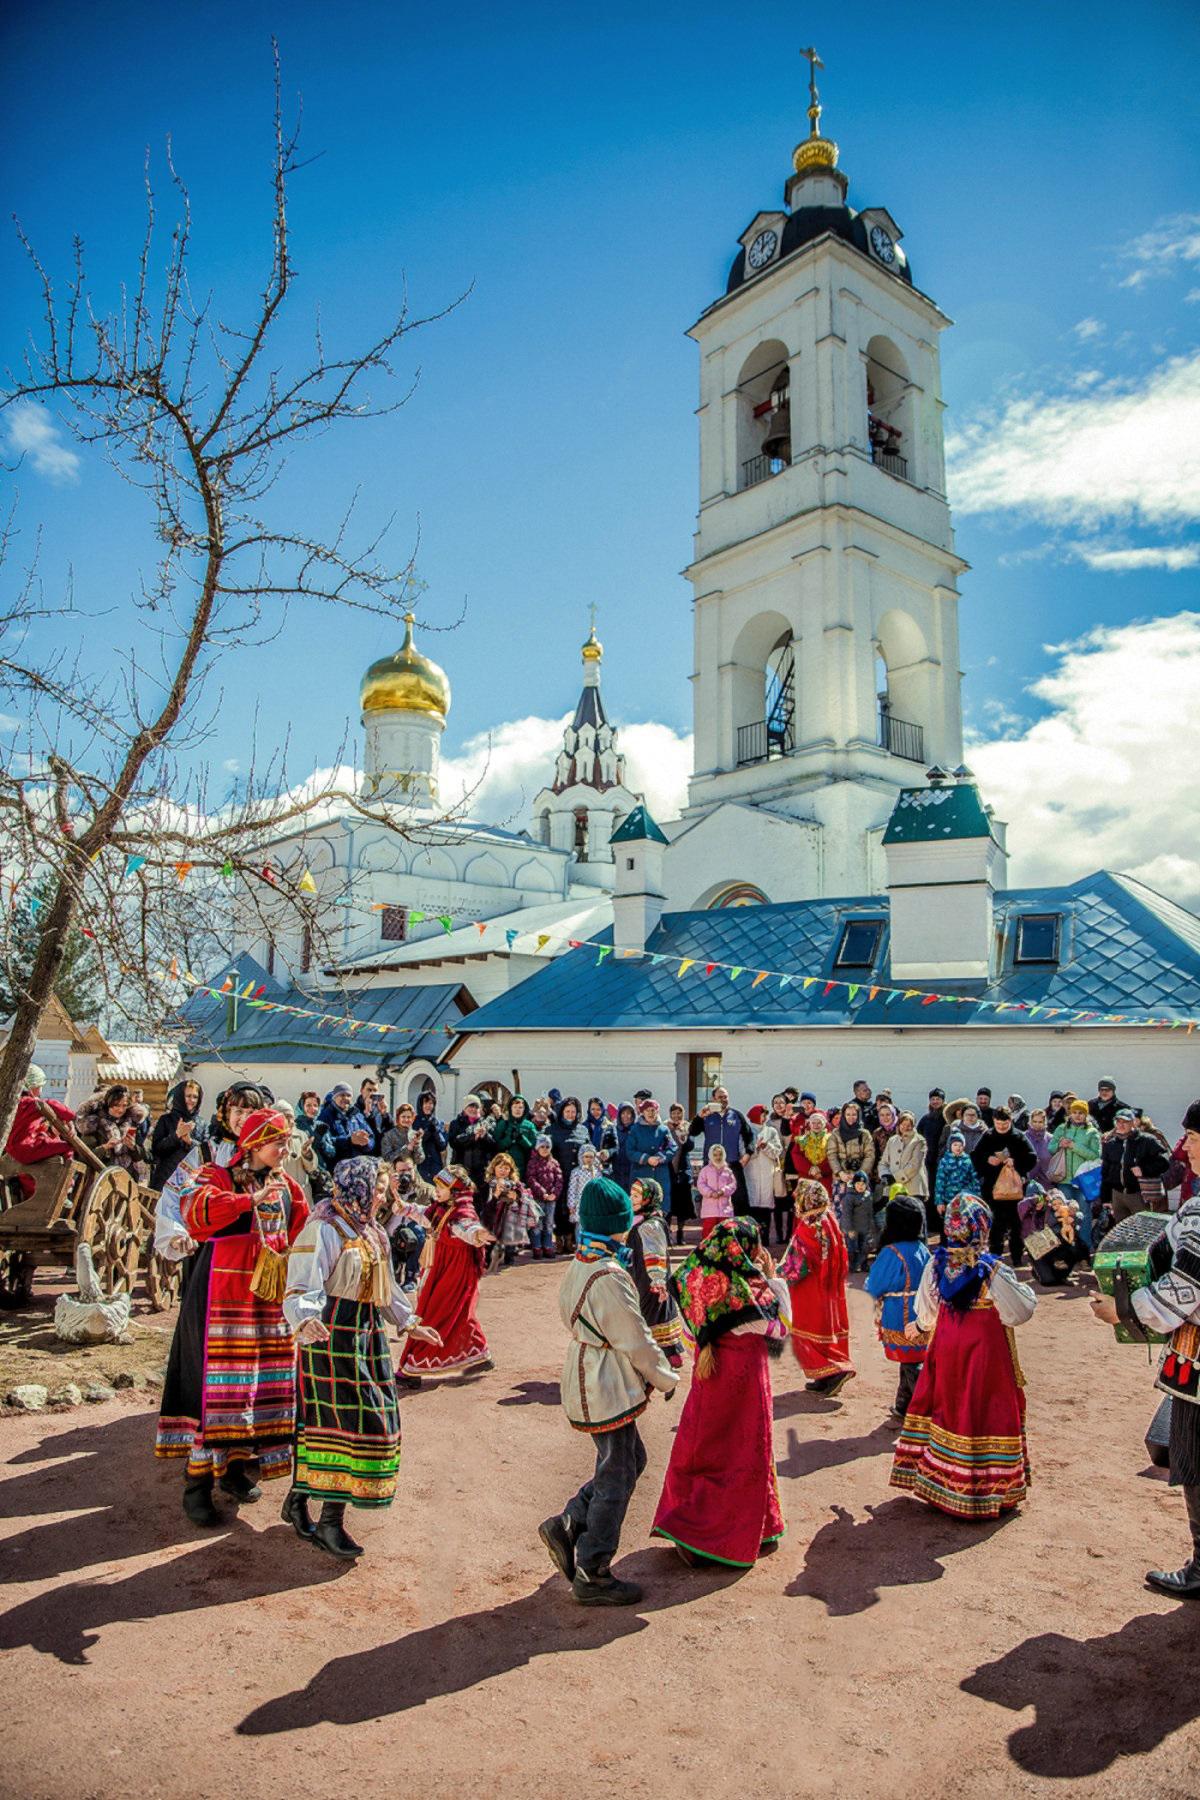 00 russia dancers krasnogorsk raion moscow oblast 290417